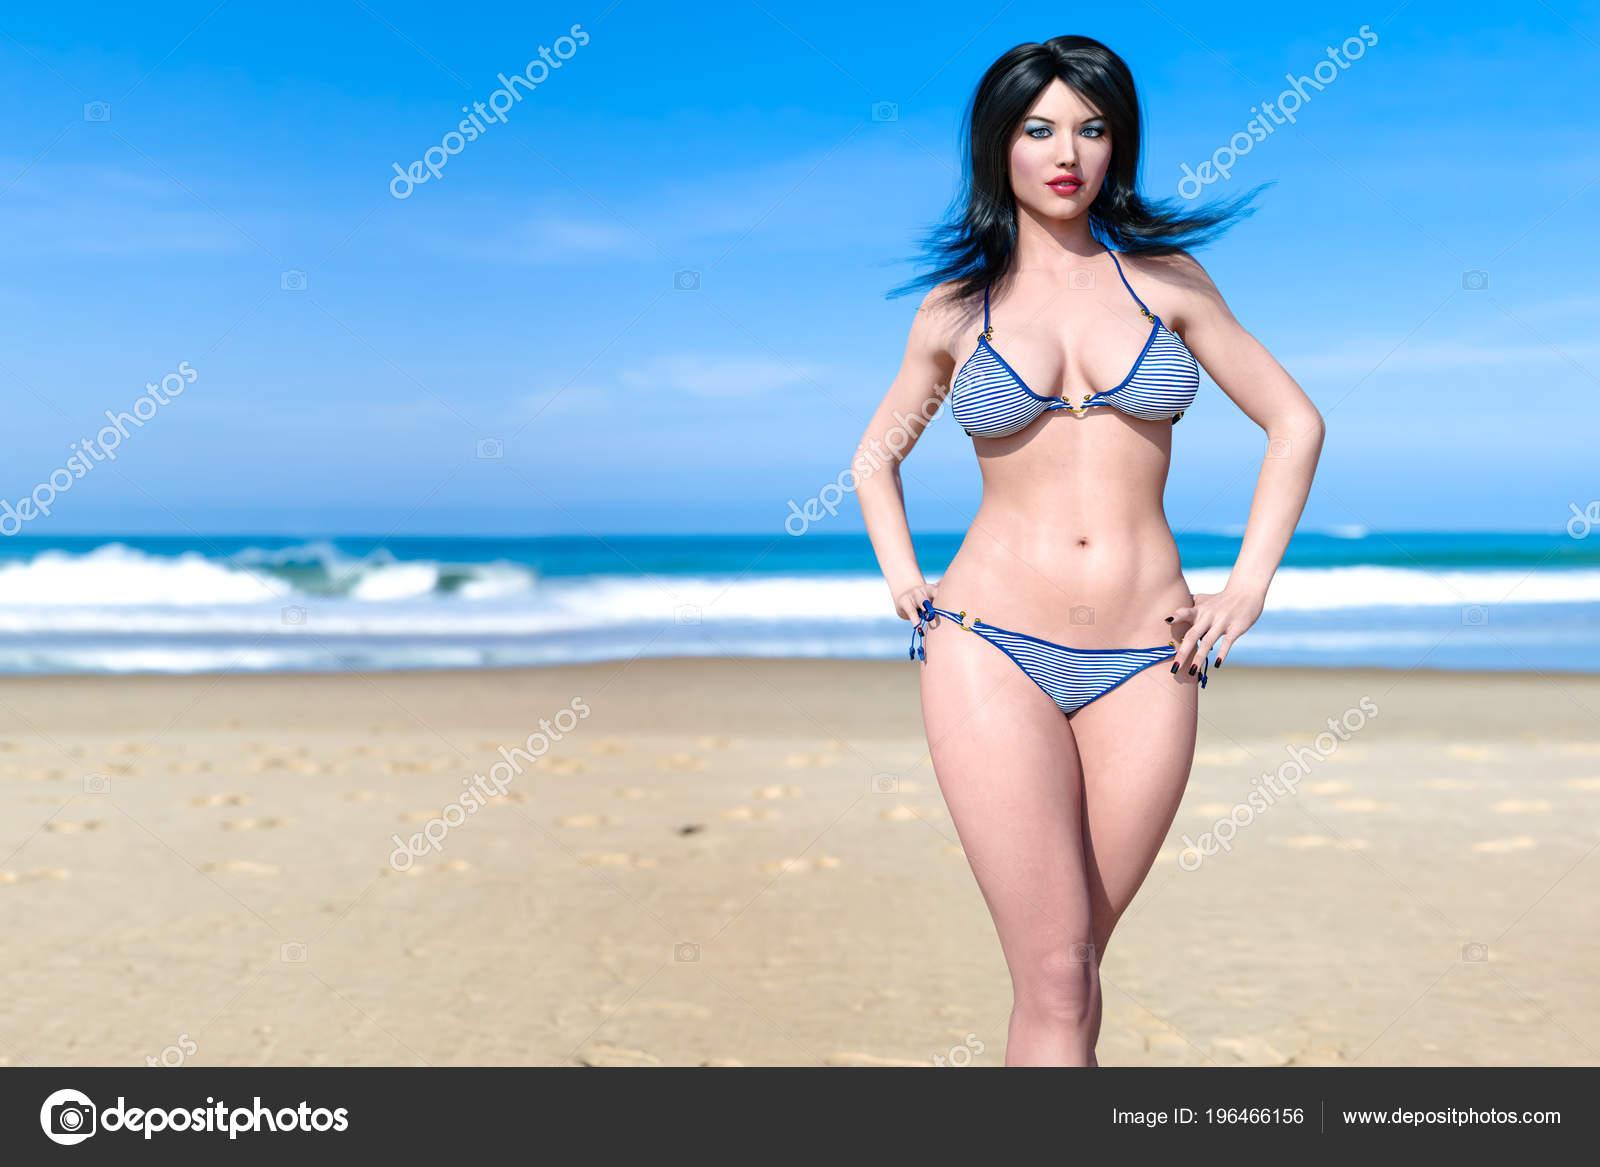 0935d1da3a Blue ocean background. Sunny day. Conceptual fashion art. Seductive candid  pose. Realistic render illustration.– stock image. Beautiful Woman Swimsuit  ...